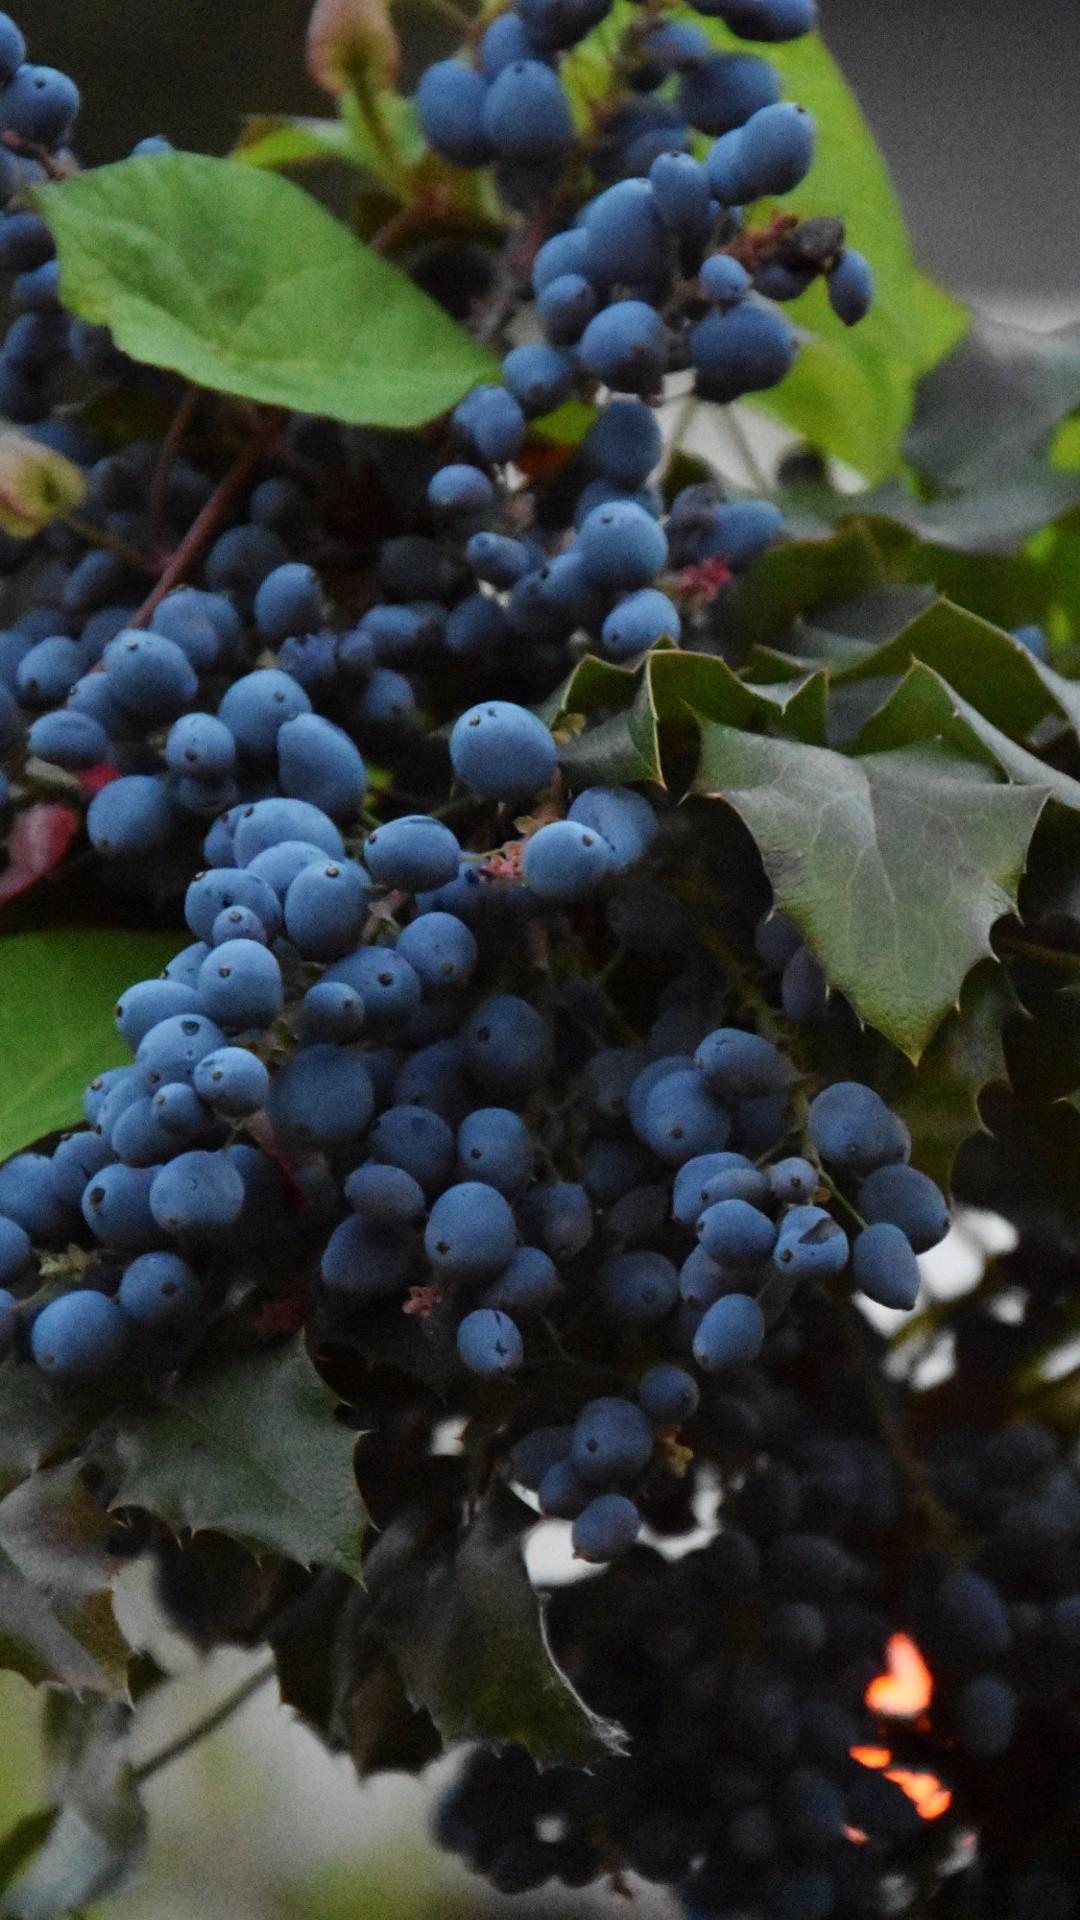 Vineyard Vines iPhone wallpaper